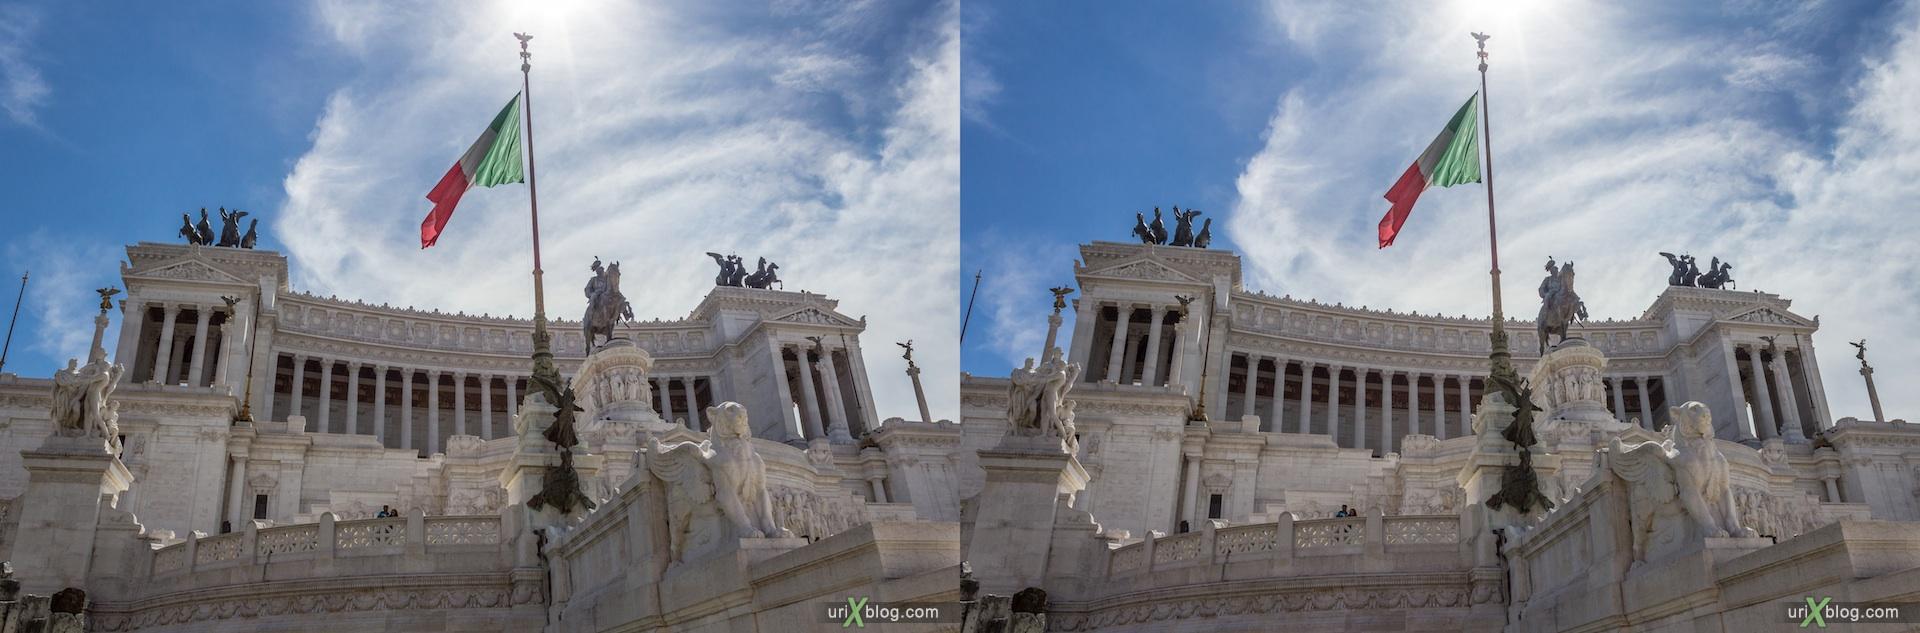 2012, the Vittoriano (Monument of Vittorio Emanuele II), 3D, stereo pair, cross-eyed, crossview, cross view stereo pair